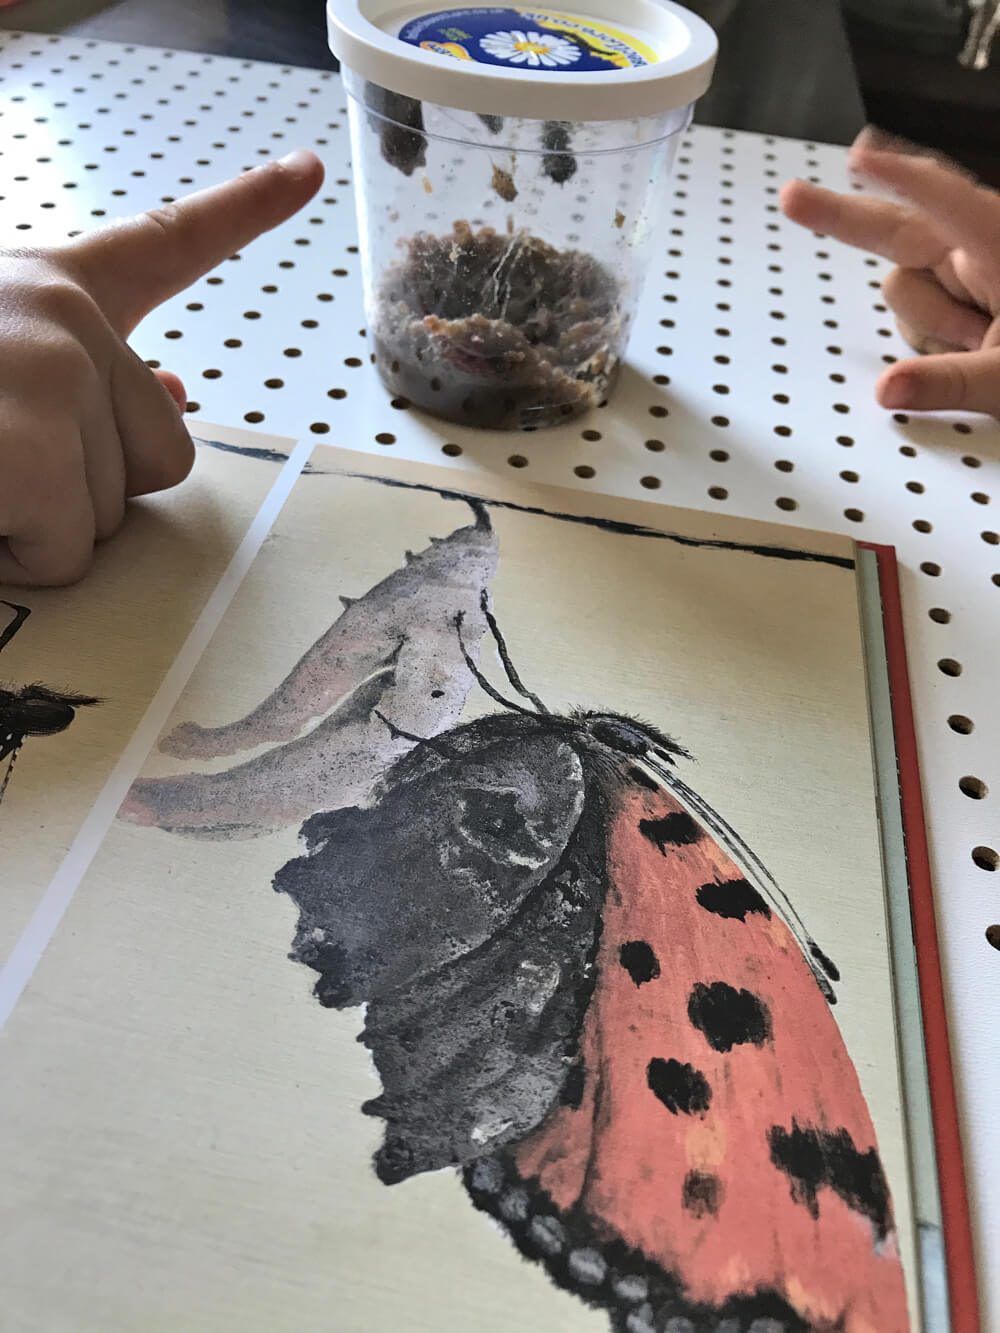 insect lore die kleine botin 3